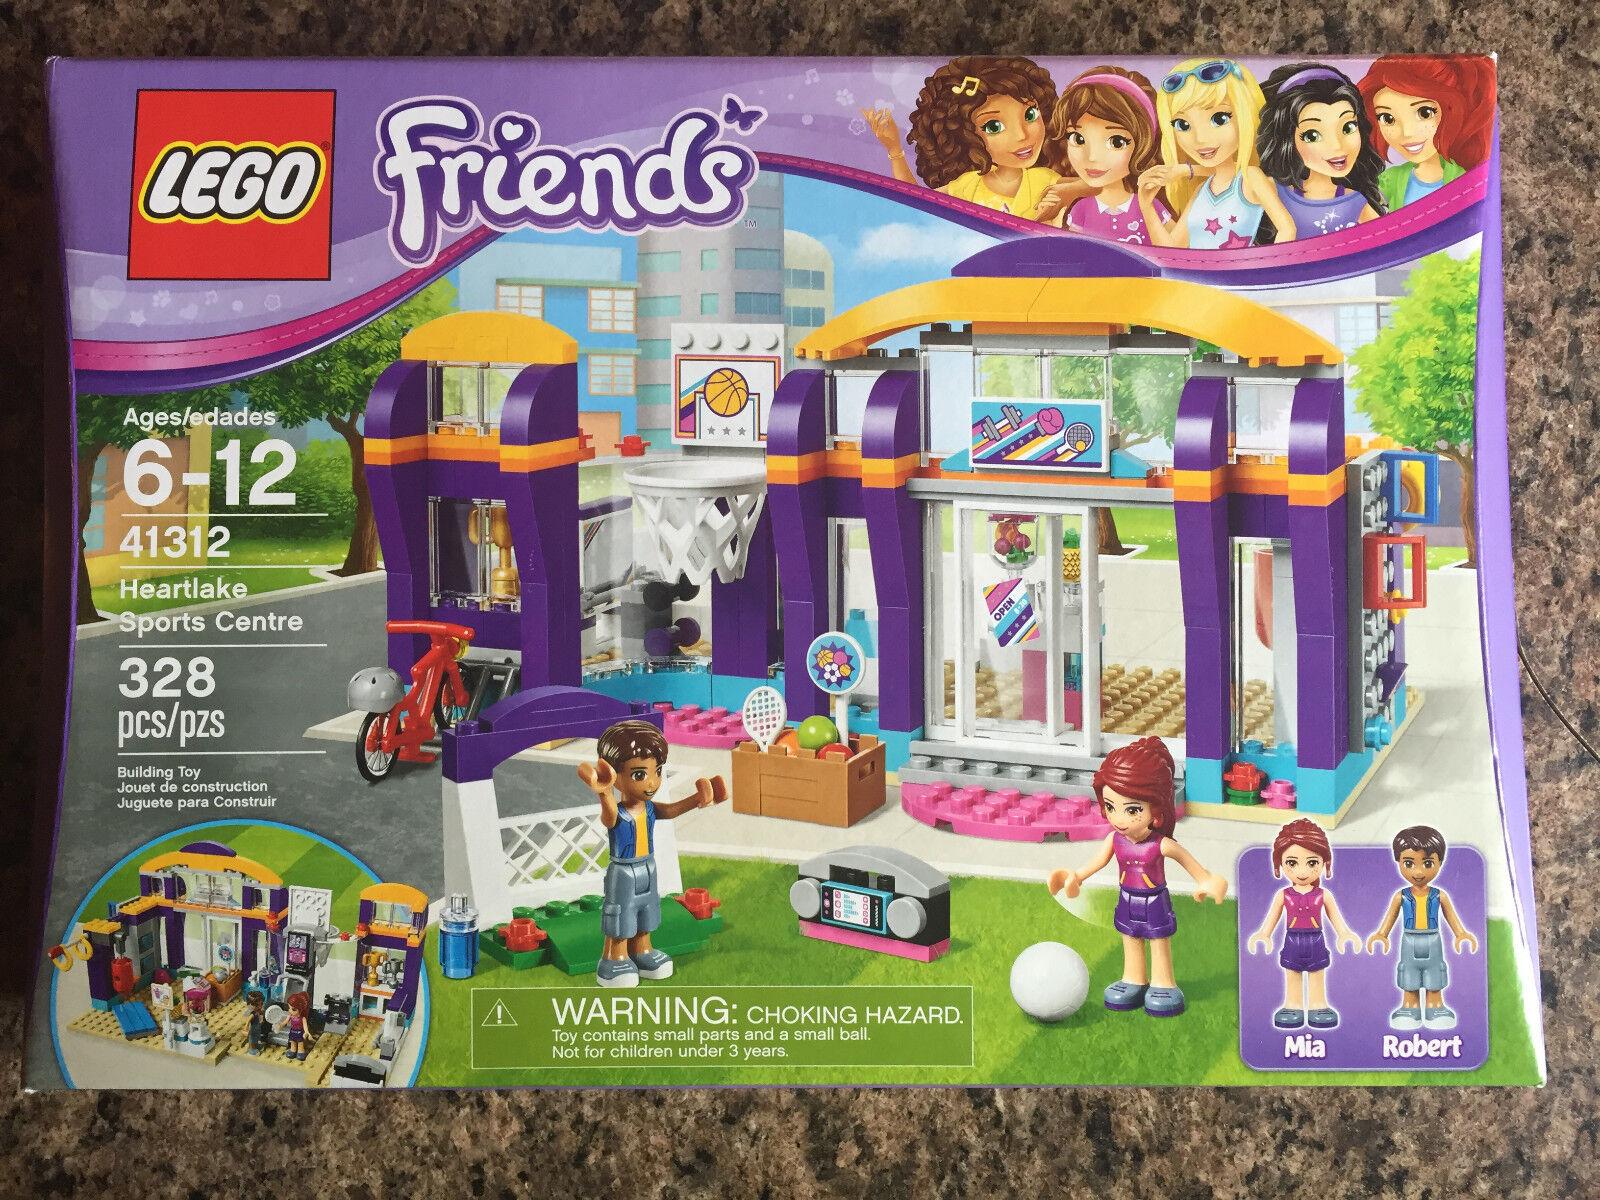 SEALED LEGO Friends HEARTLAKE SPORTS CENTRE 41312 Mia Mia Mia Robert center NEW 2017 16834b